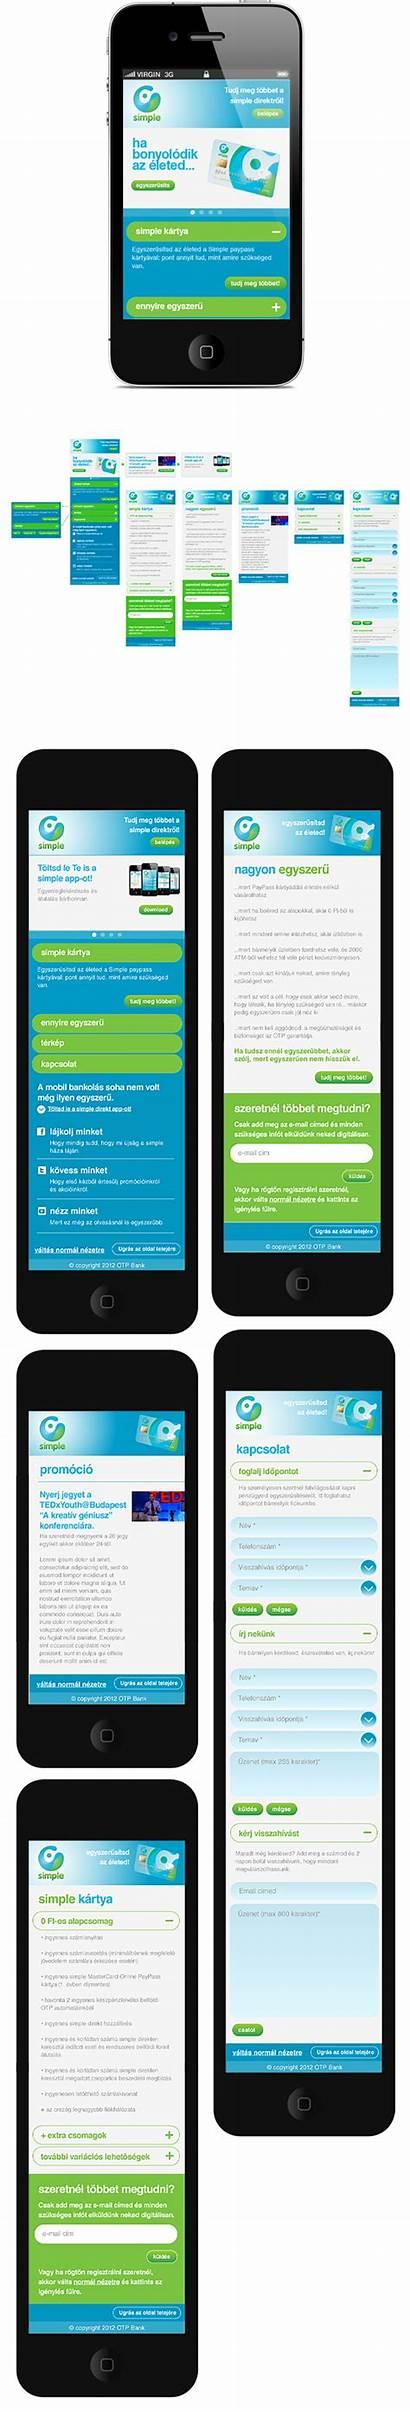 Simple Bank Ui Mobile Behance